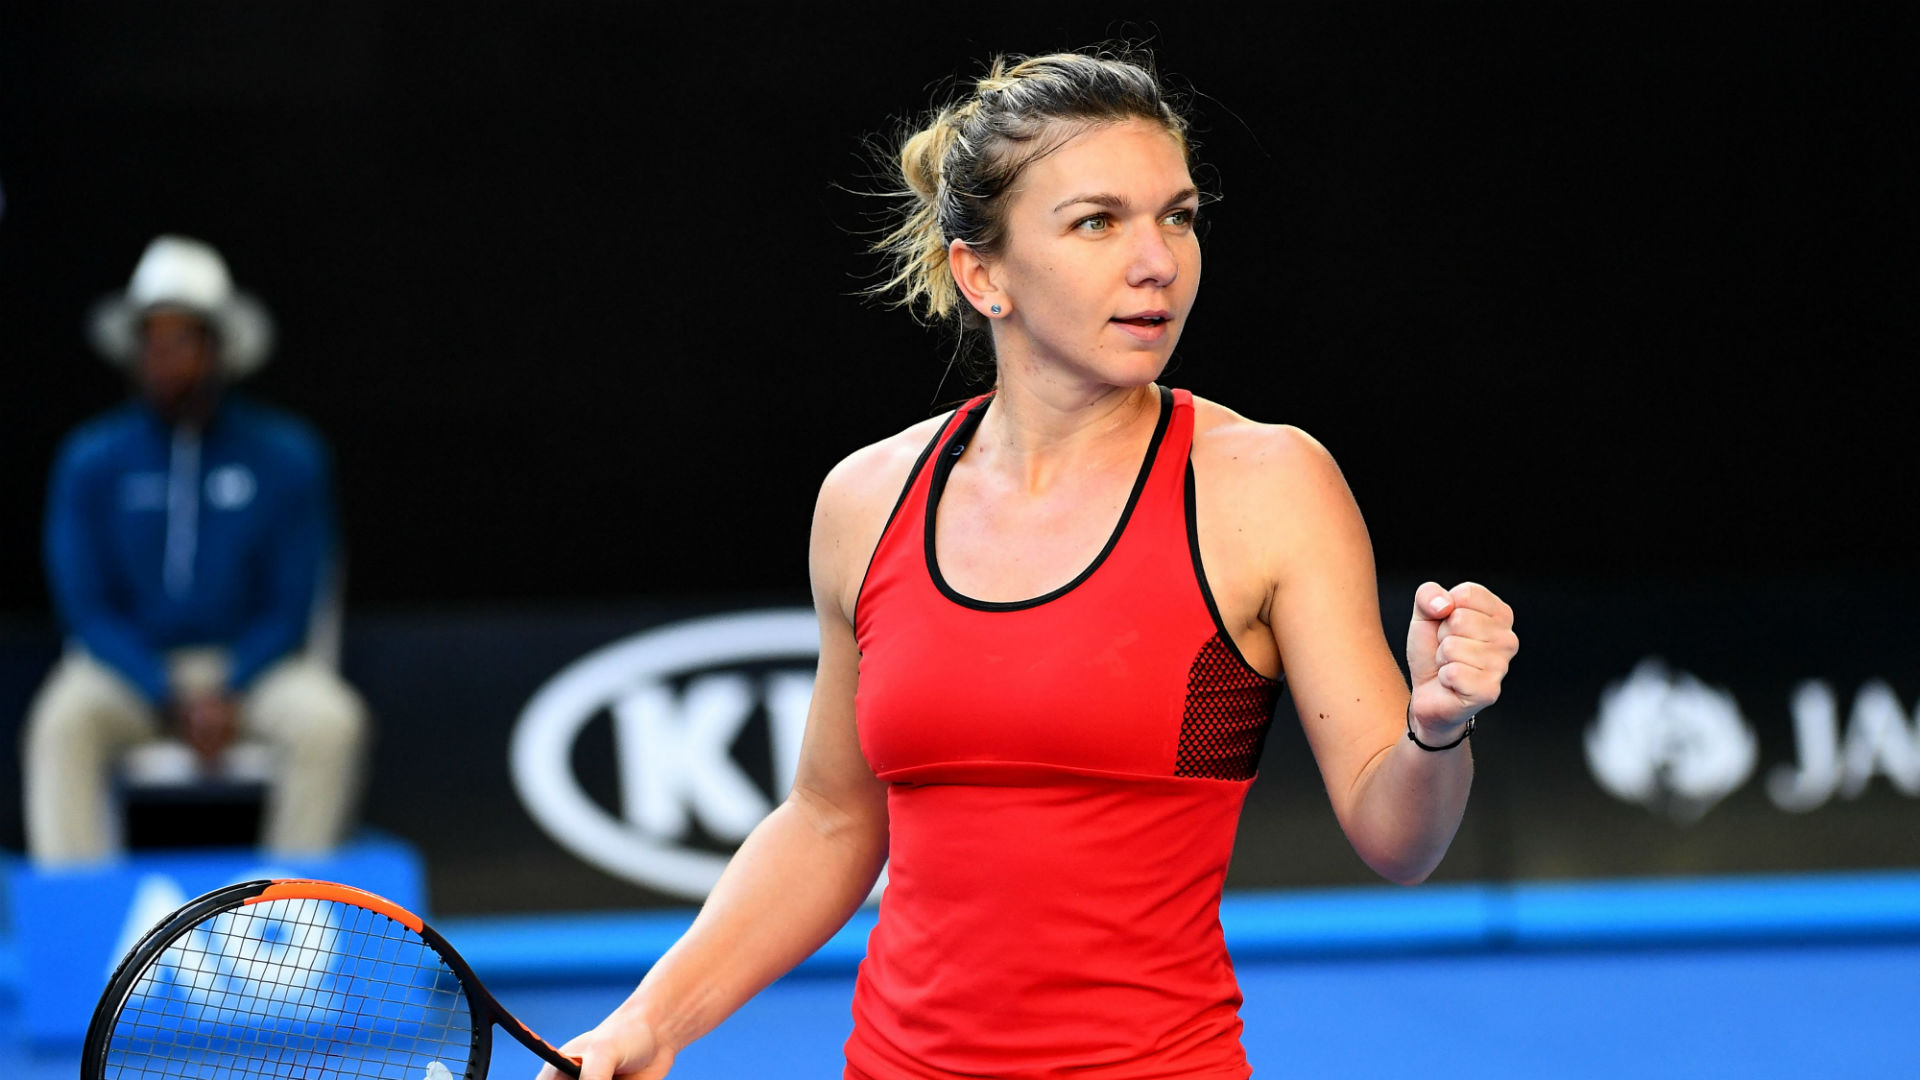 Madison Keys advances to 4th round at Australian Open